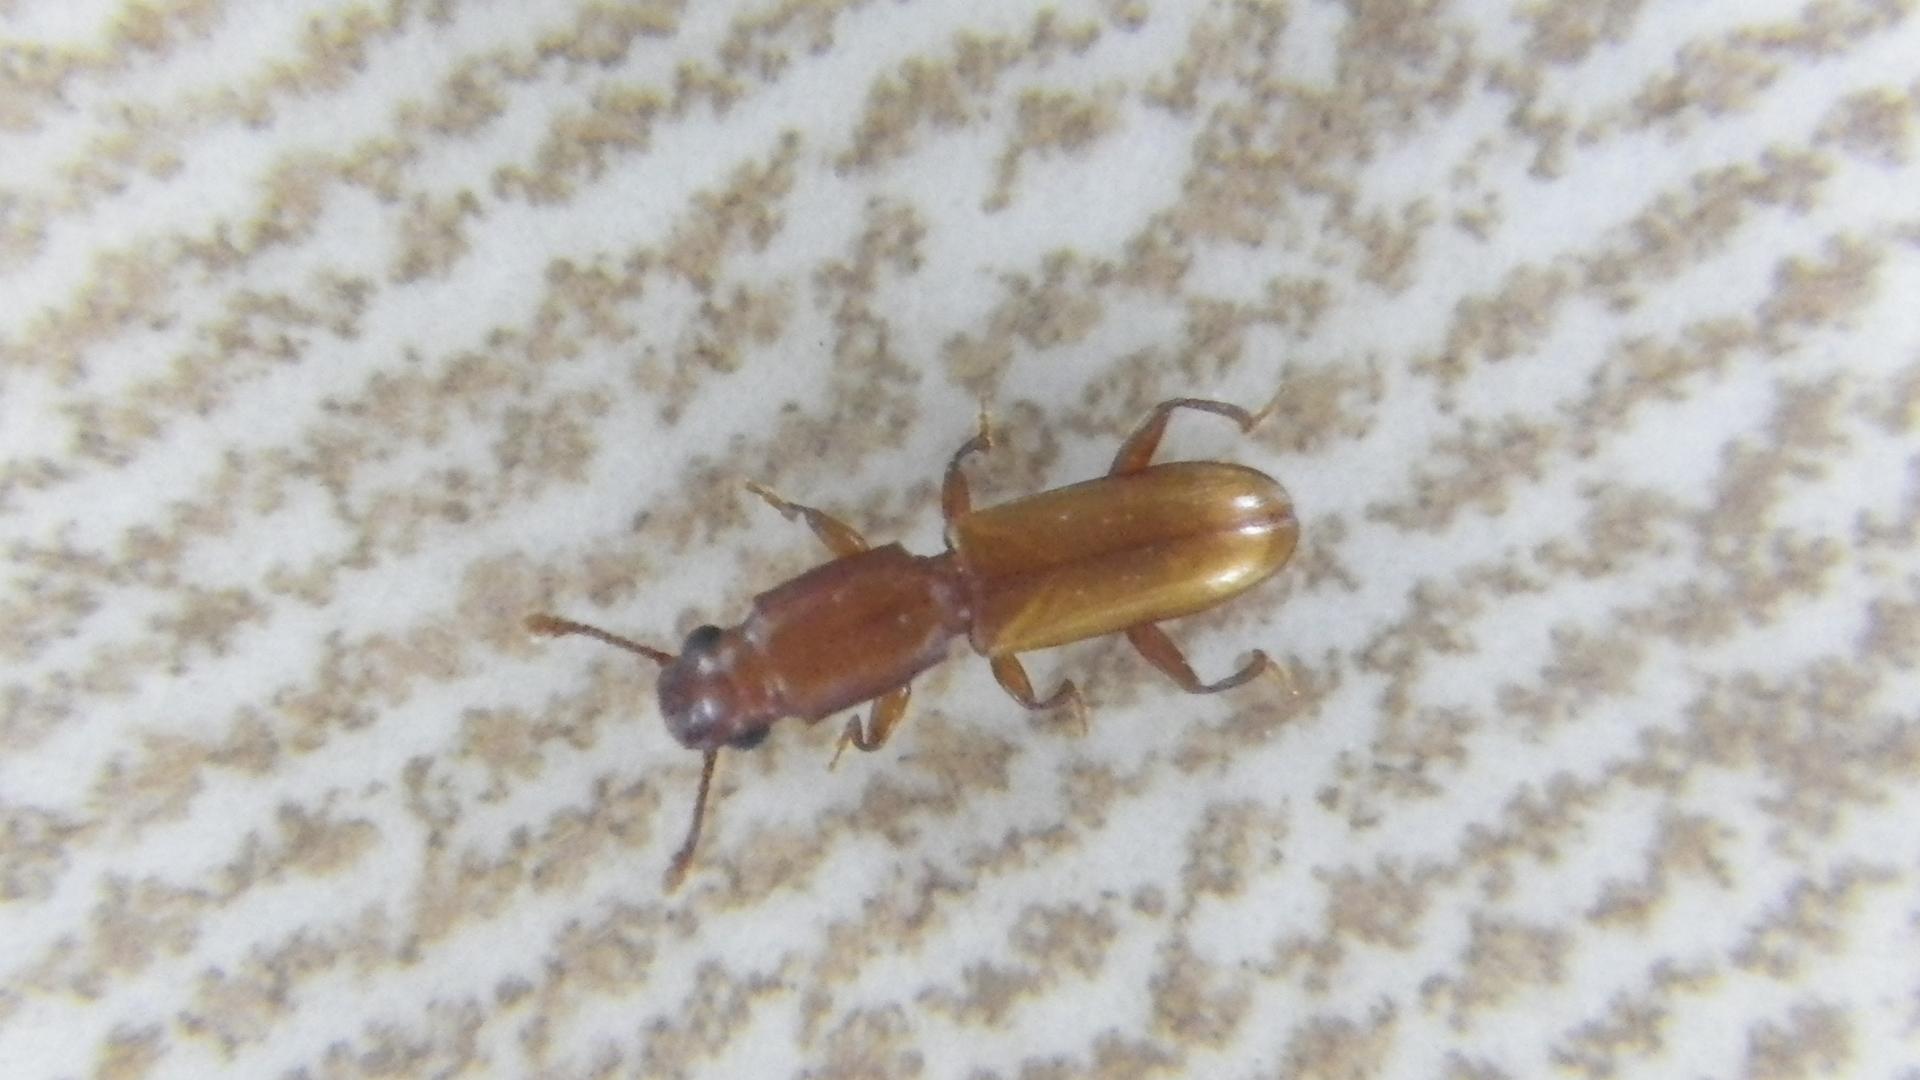 Cathartus quadricollis  - Square-necked Grain Beetle Photo: Brian Spears